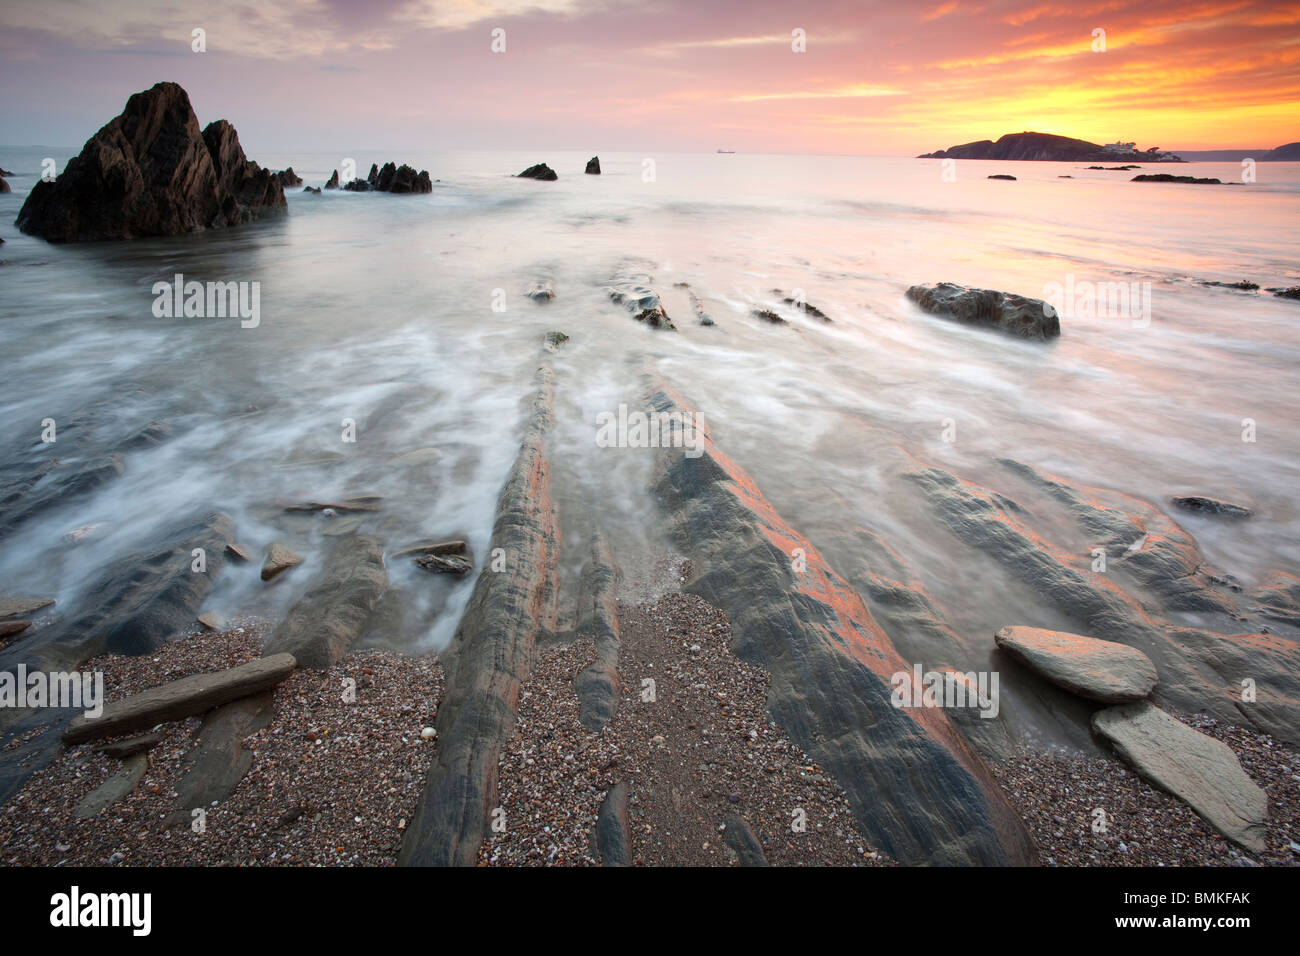 Bantham Bay at Sunset, Devon, UK - Stock Image